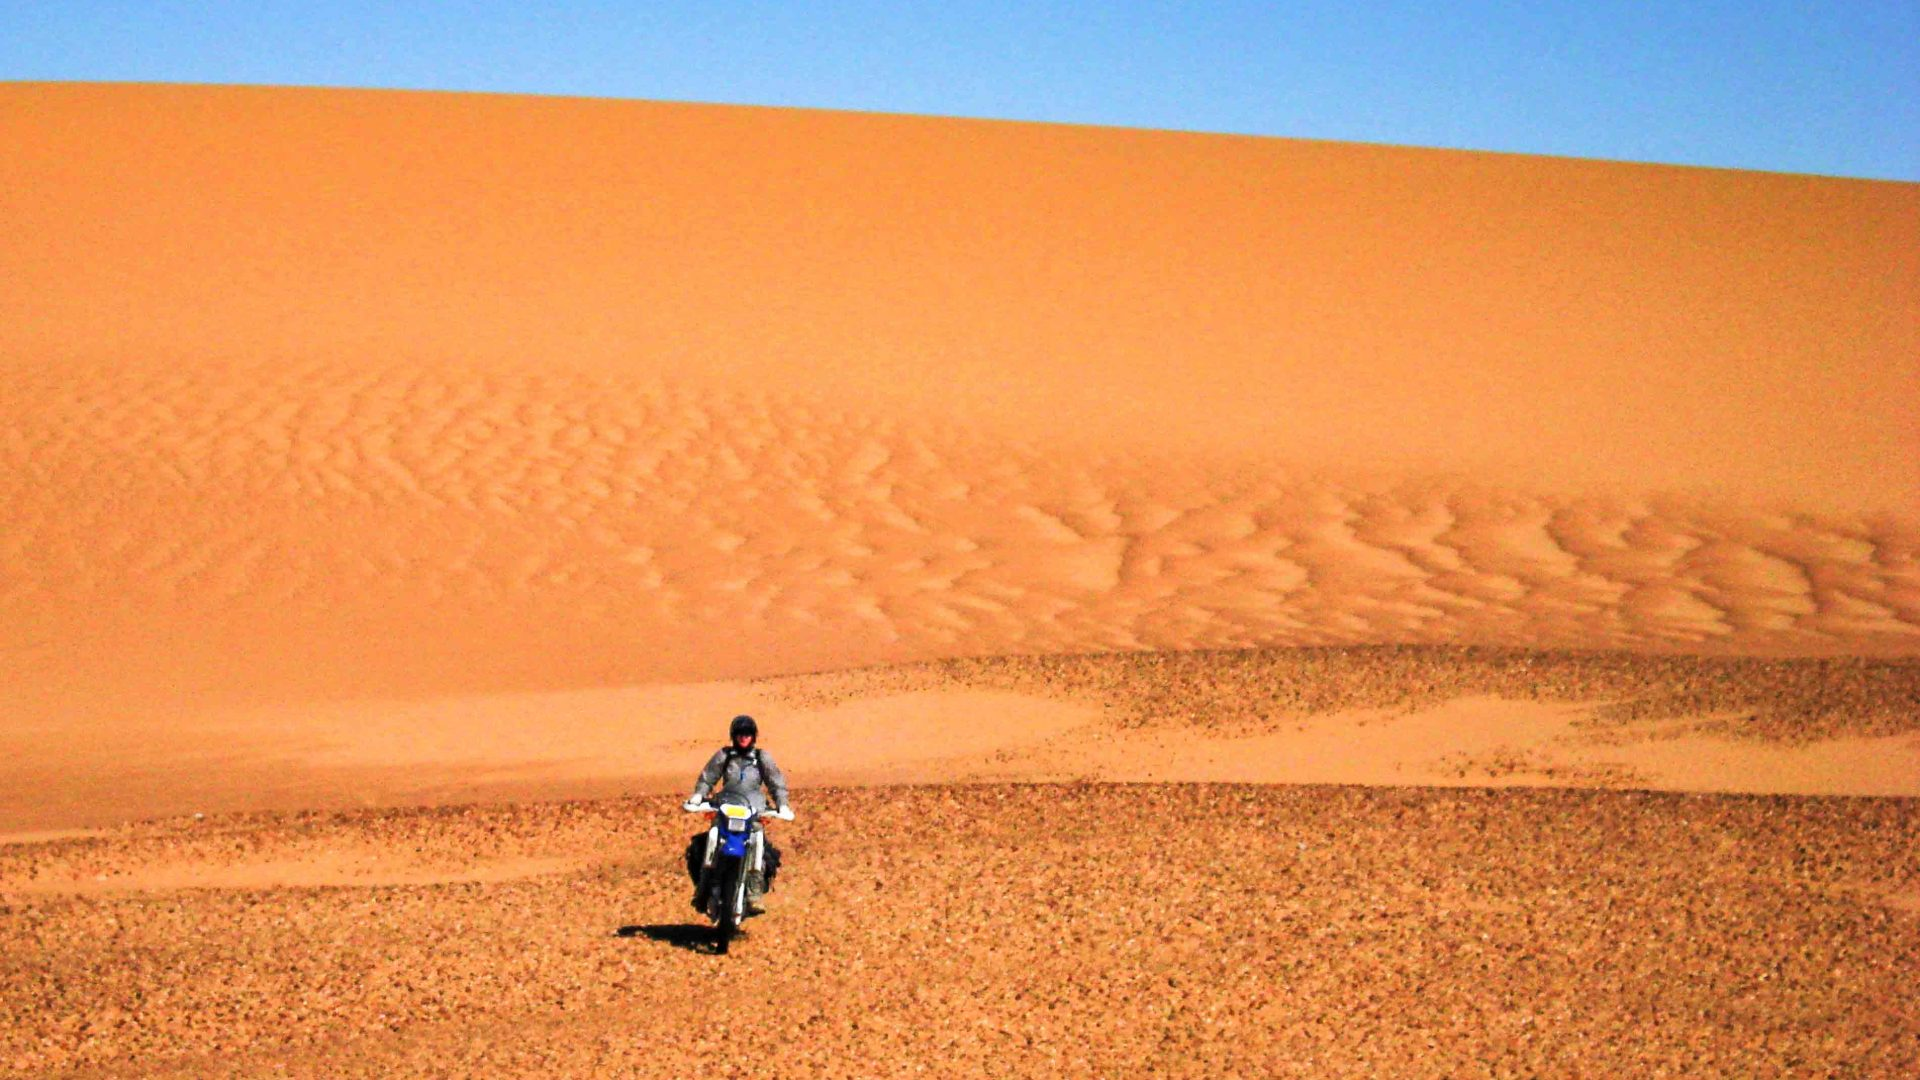 Lois rides her motorcycle across orange sand dunes in Niger.